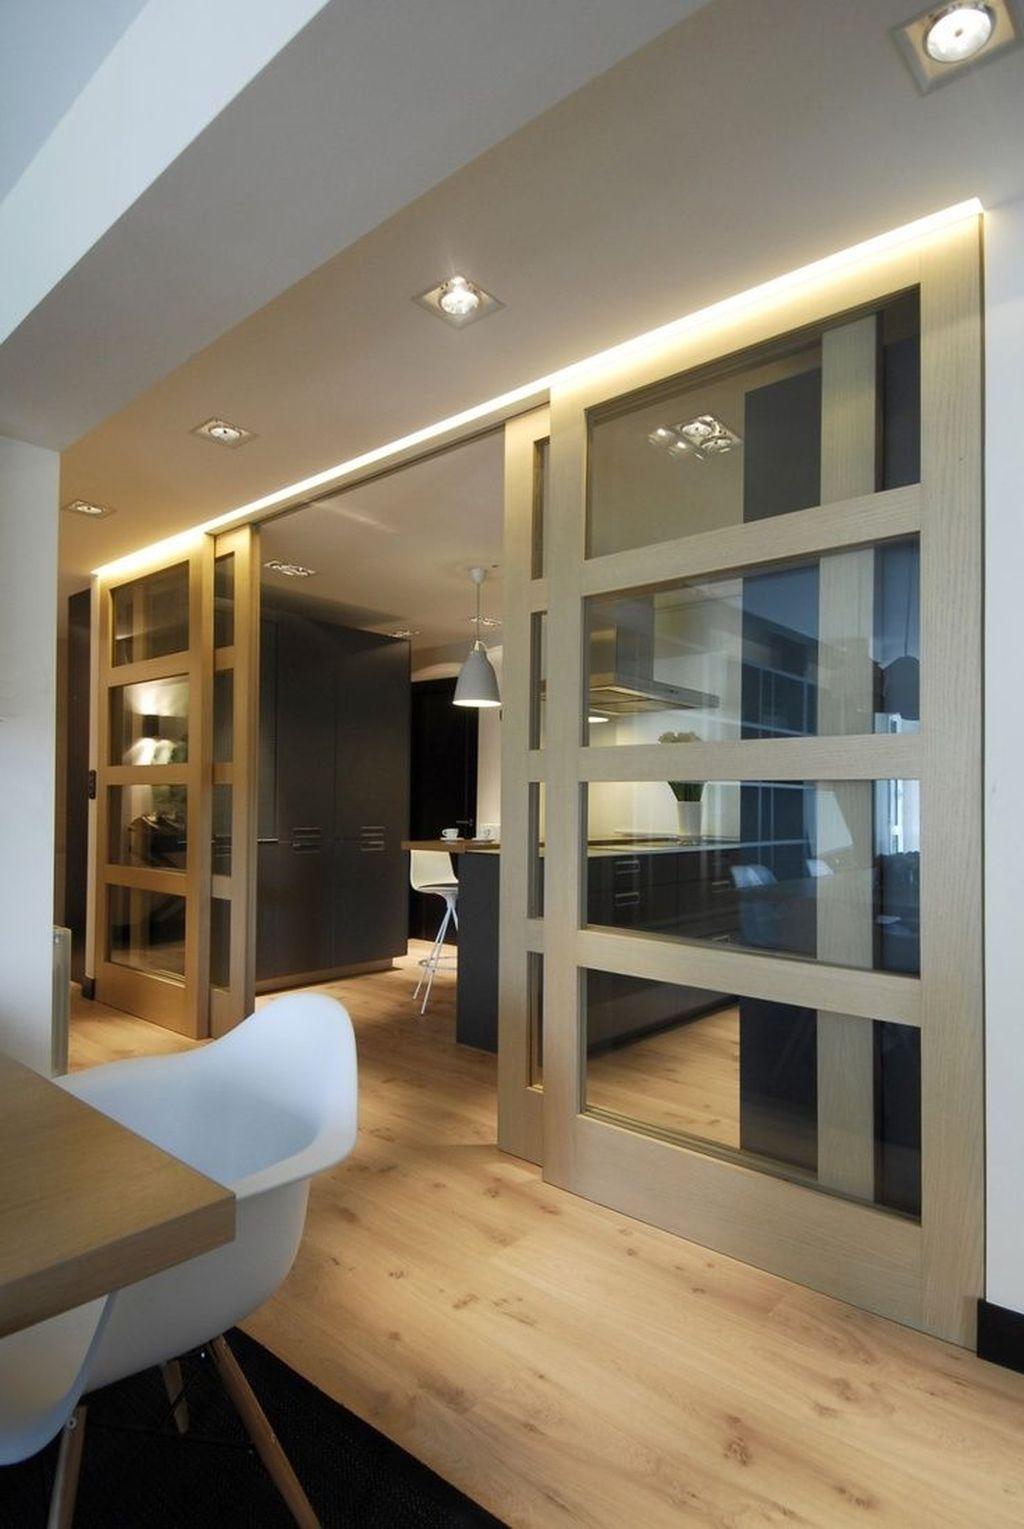 Porte Separation Salon Cuisine 30+ beautiful open kitchens with unique partitions and room